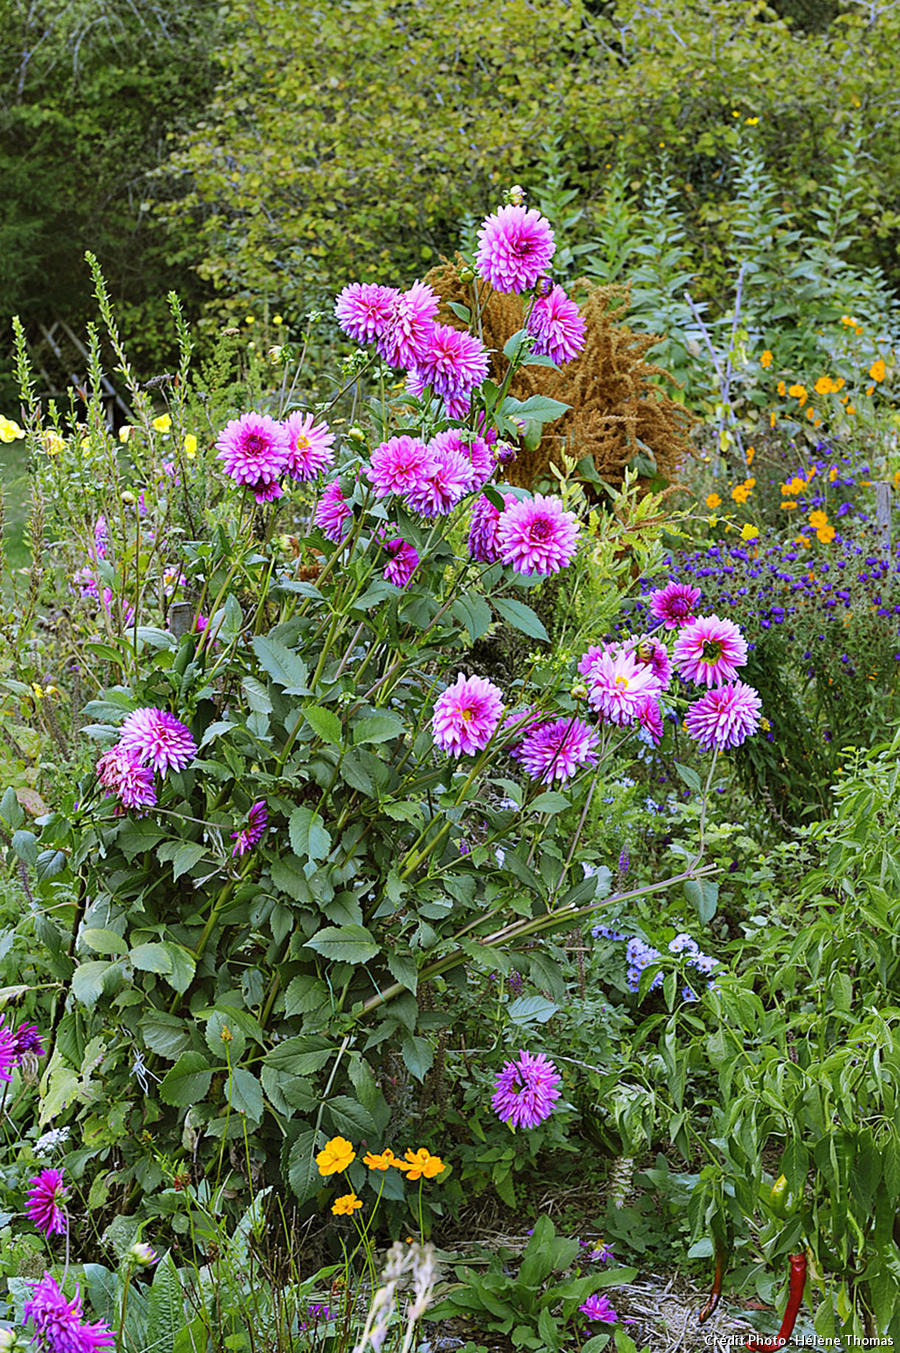 Jardins de l'Albarède, massif de dahlias